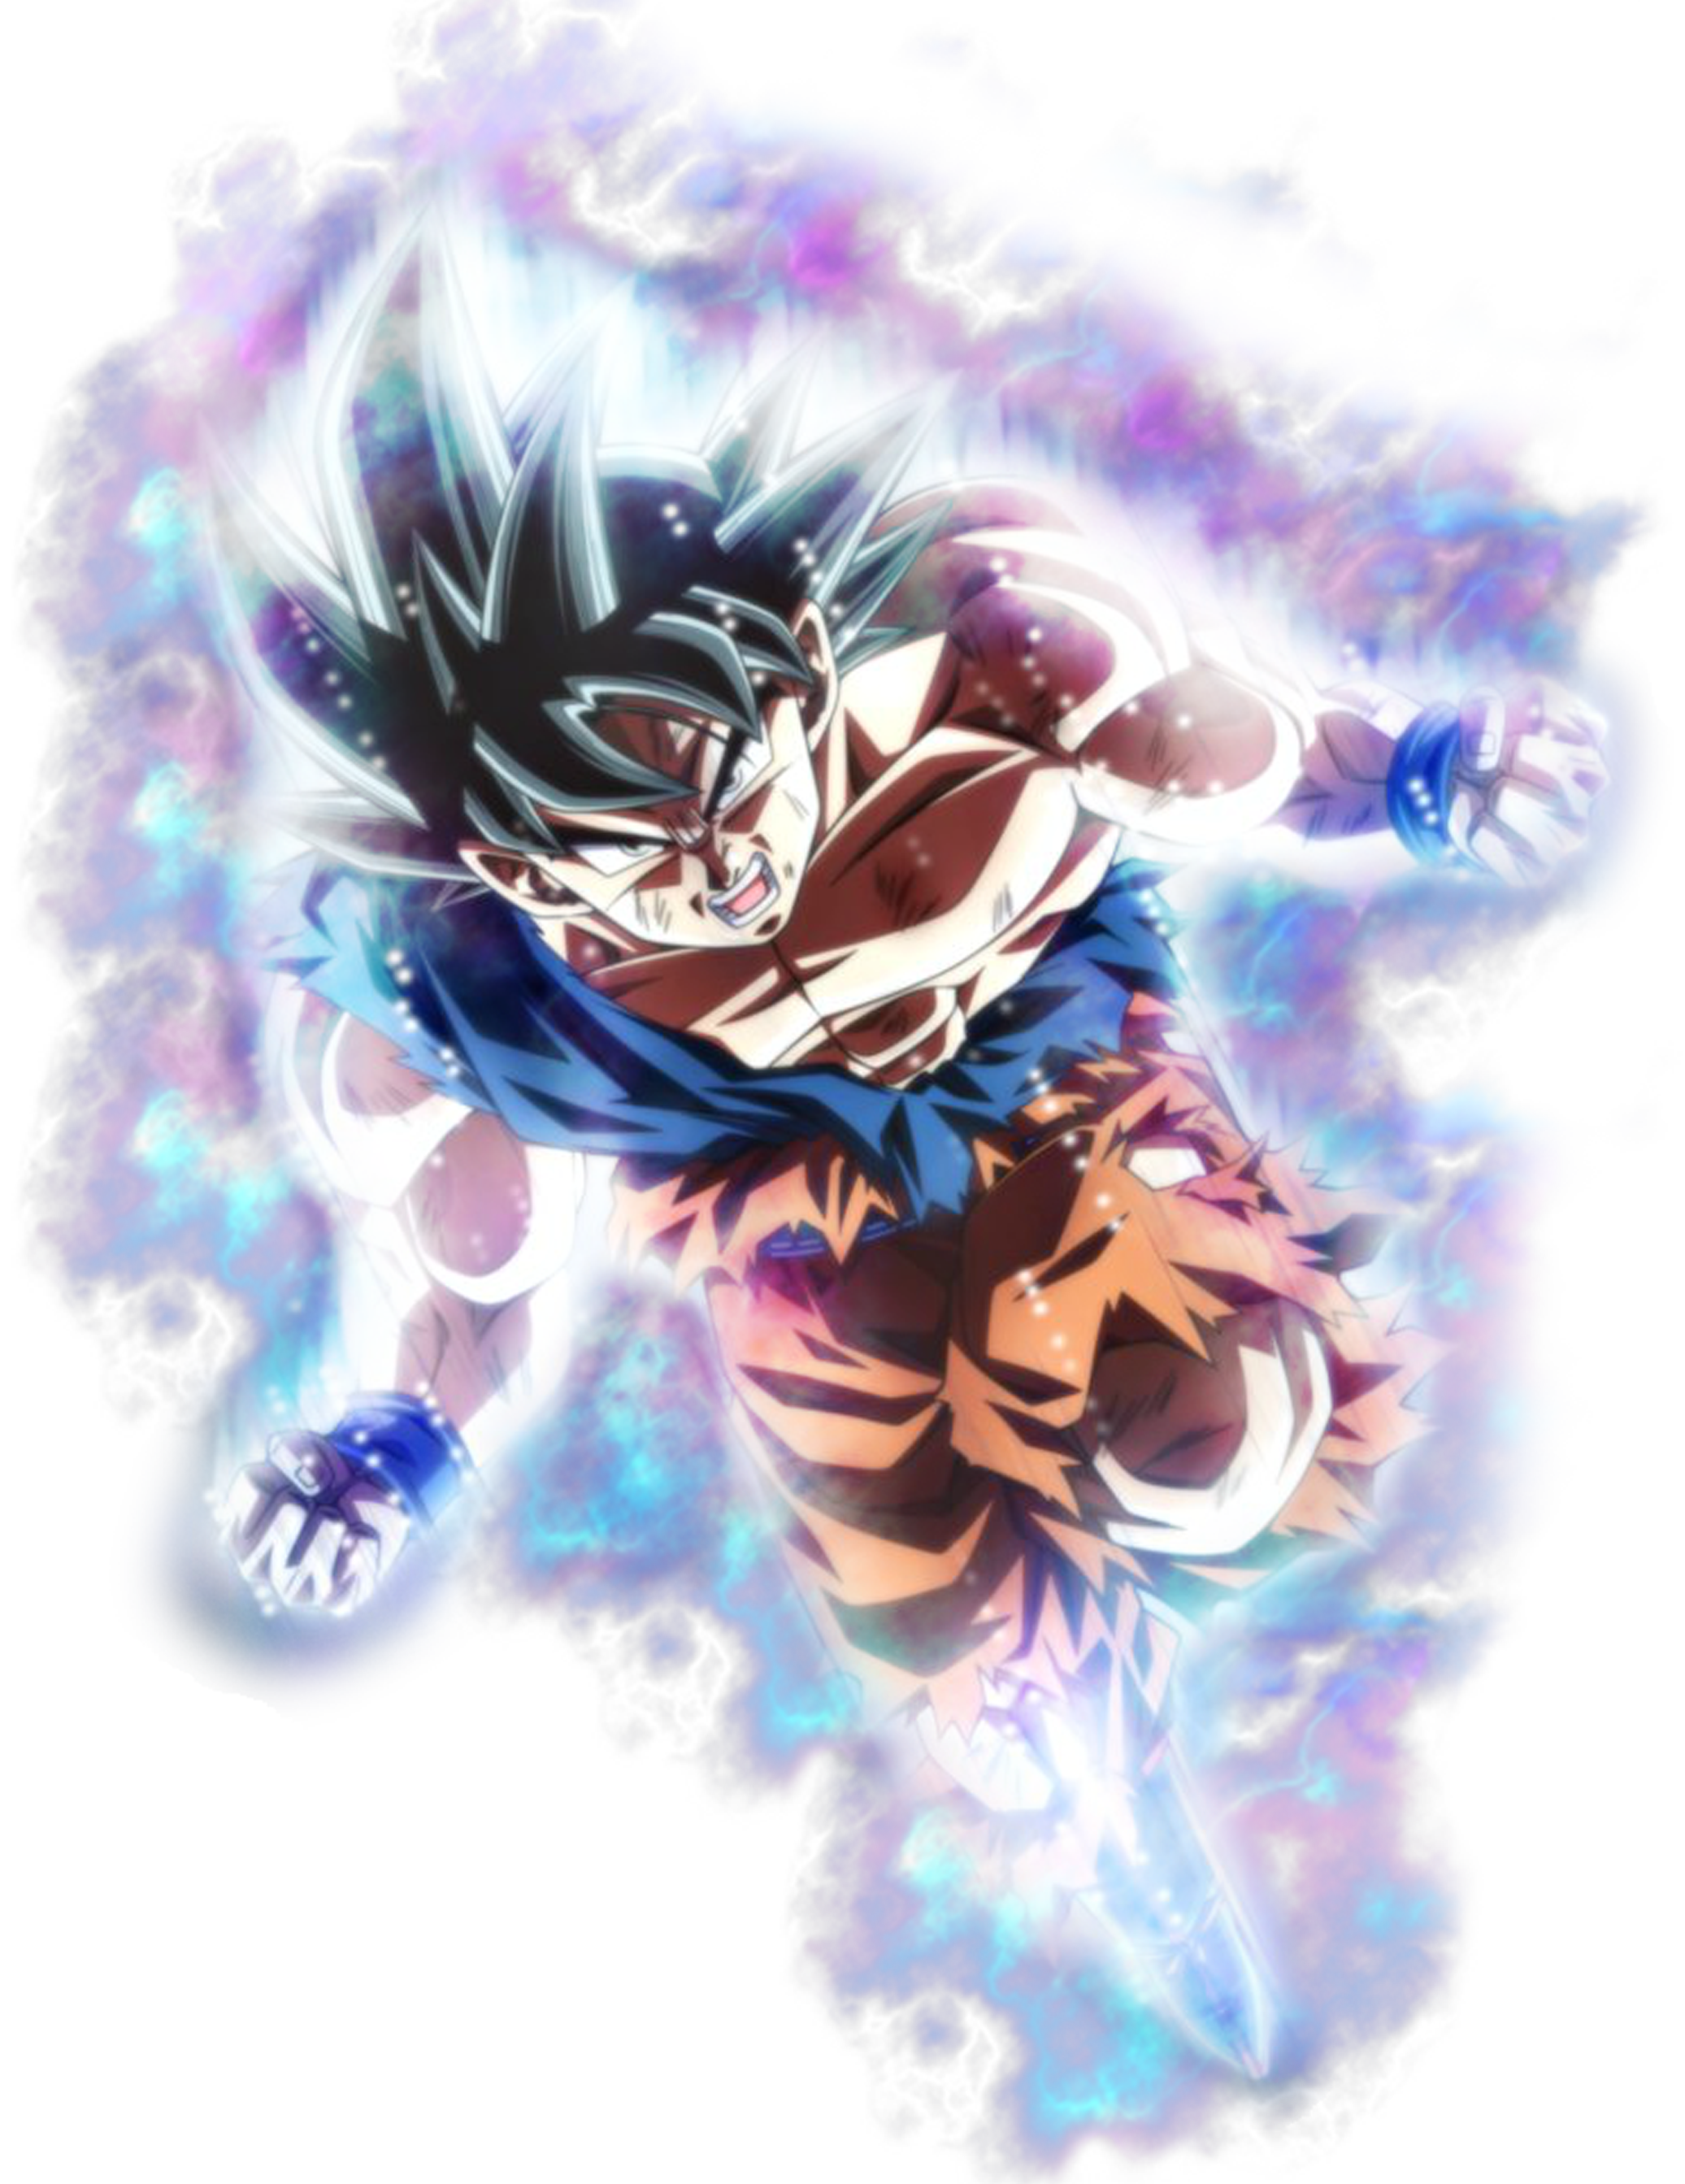 Ultra Instinct Goku Break The Limit By Azer0xhd Dragon Ball Super Wallpapers Dragon Ball Artwork Android Wallpaper Anime